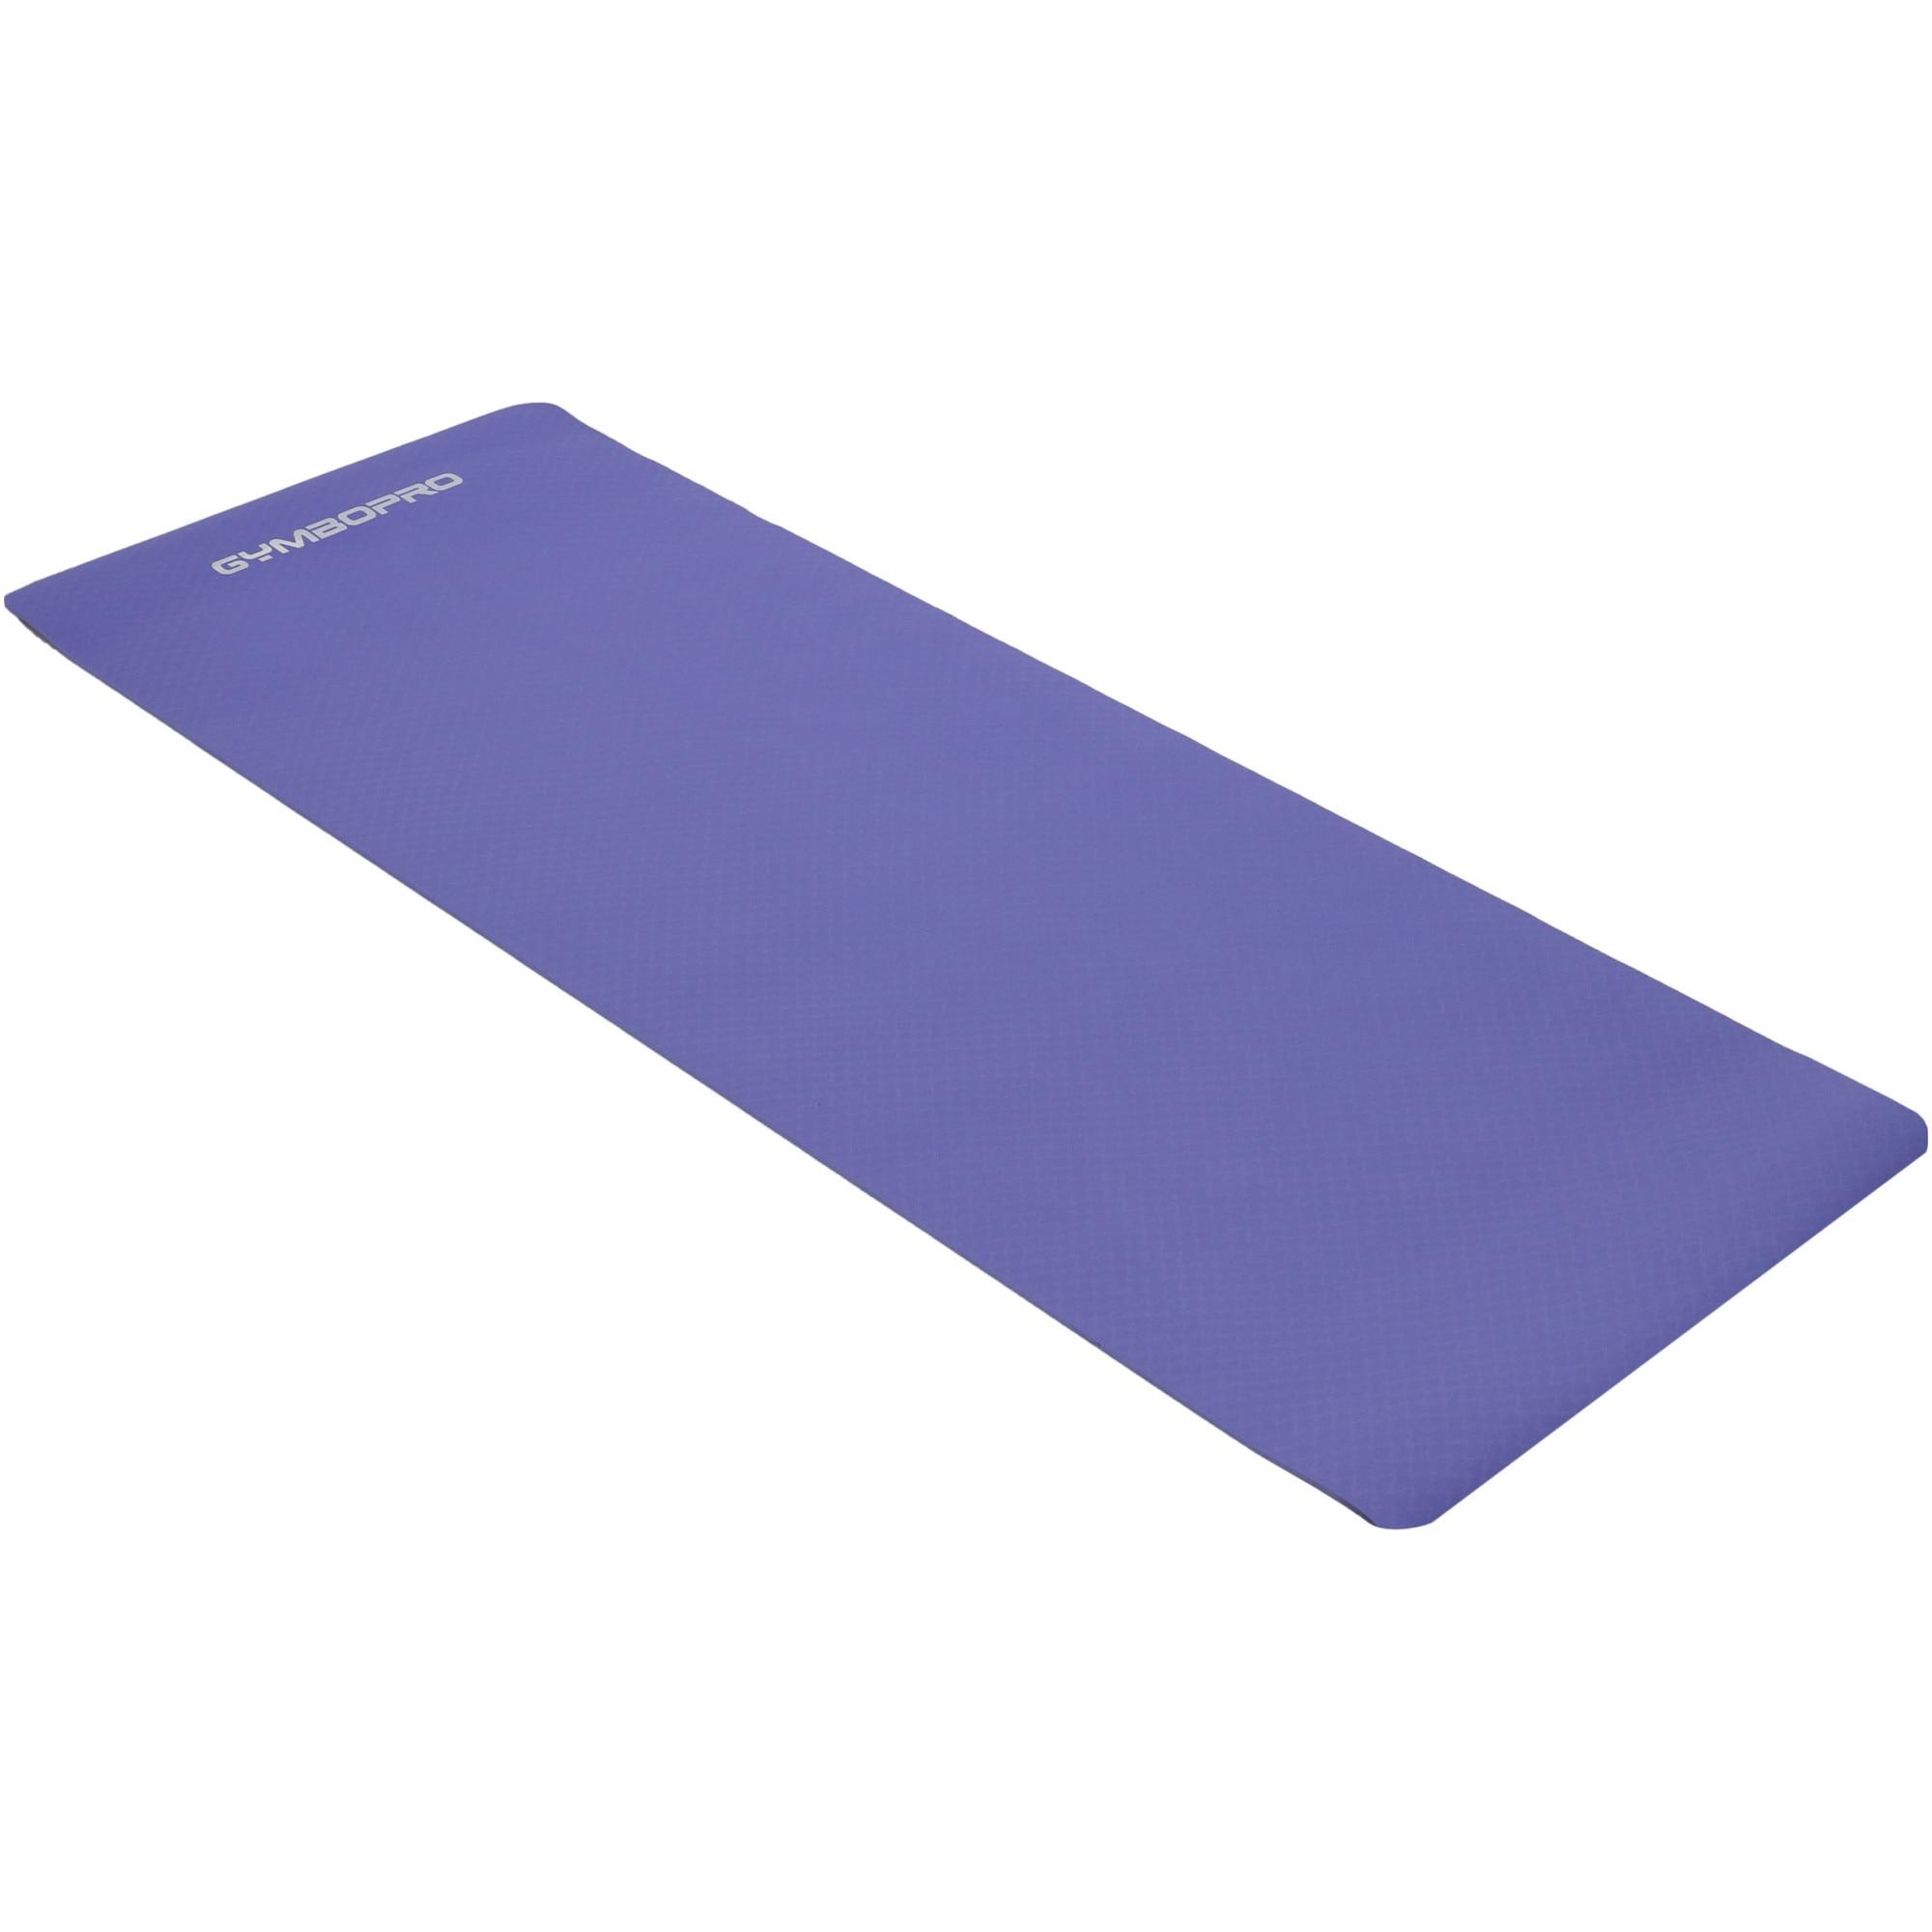 Fotografie Saltea fitness Gymbopro, dimensiune 183 x 61 cm, 0.6 cm grosime, material TPE, culoare mov